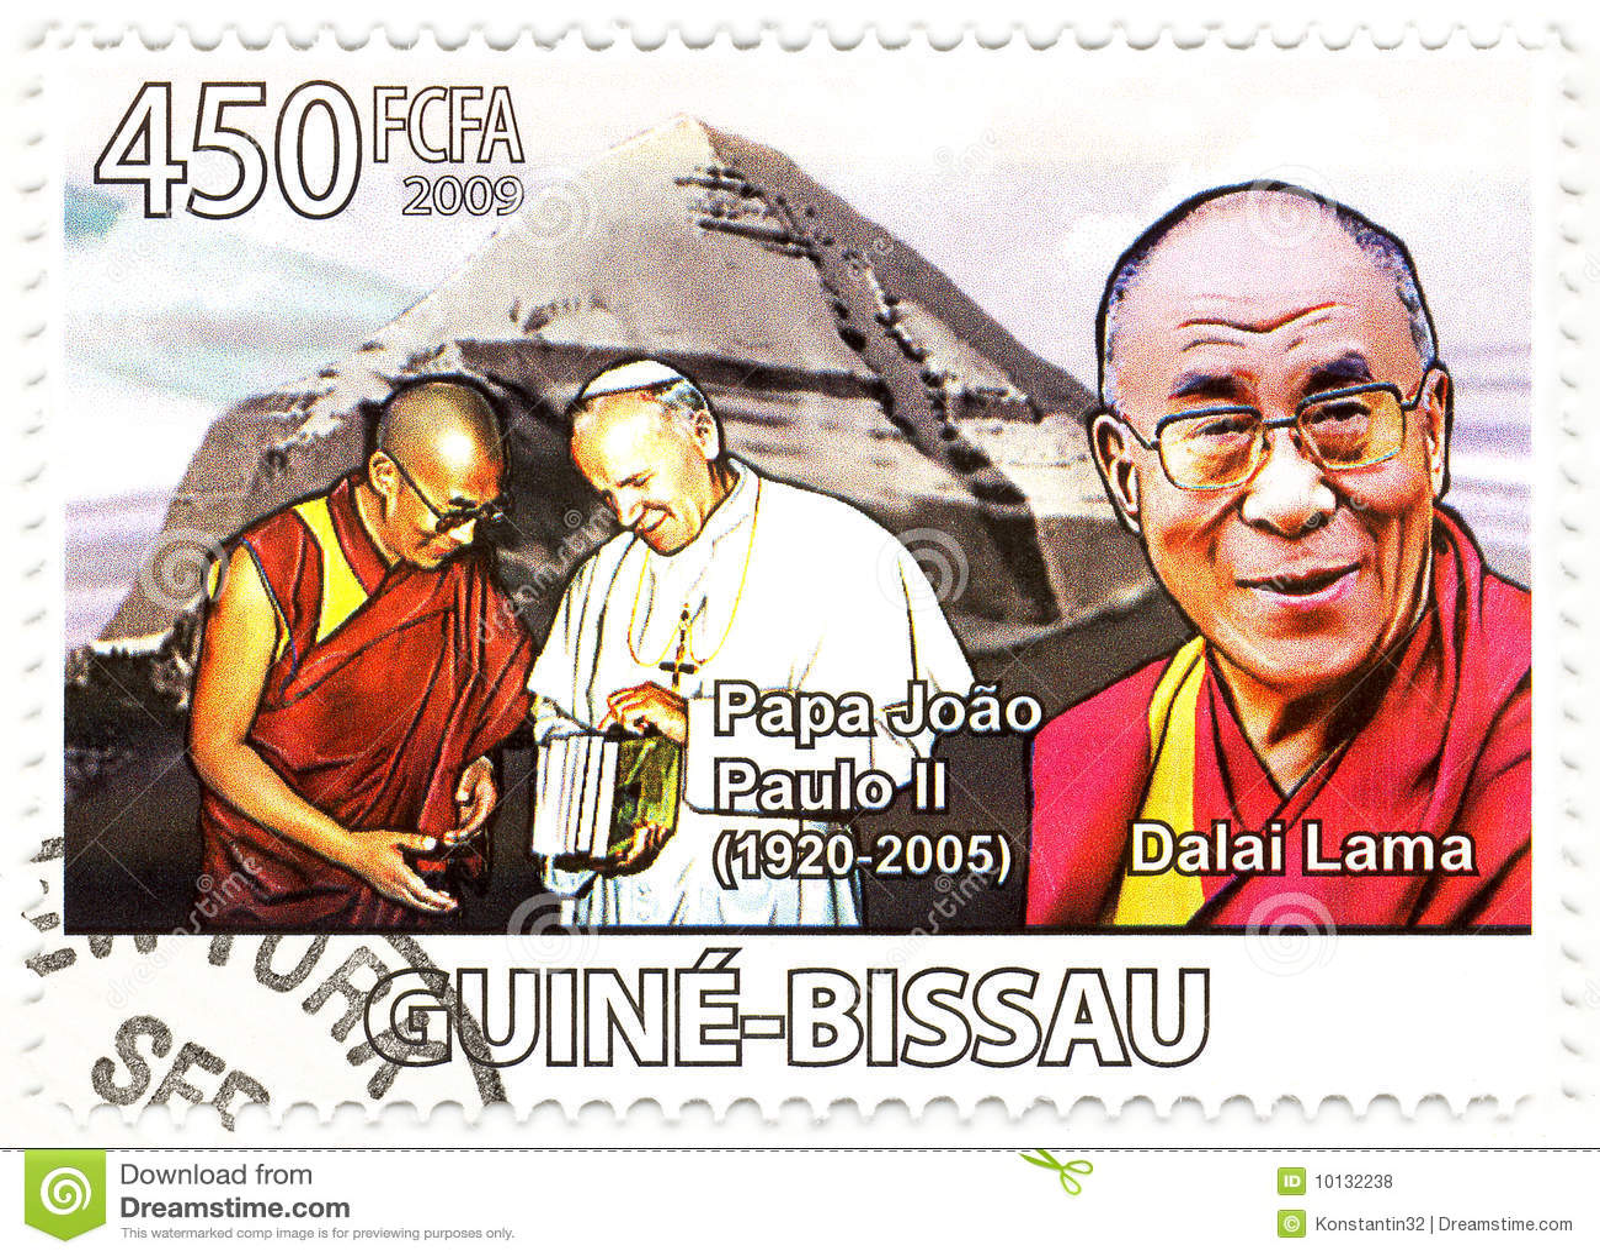 Stamp with Dalai Lama and Papa Paul II